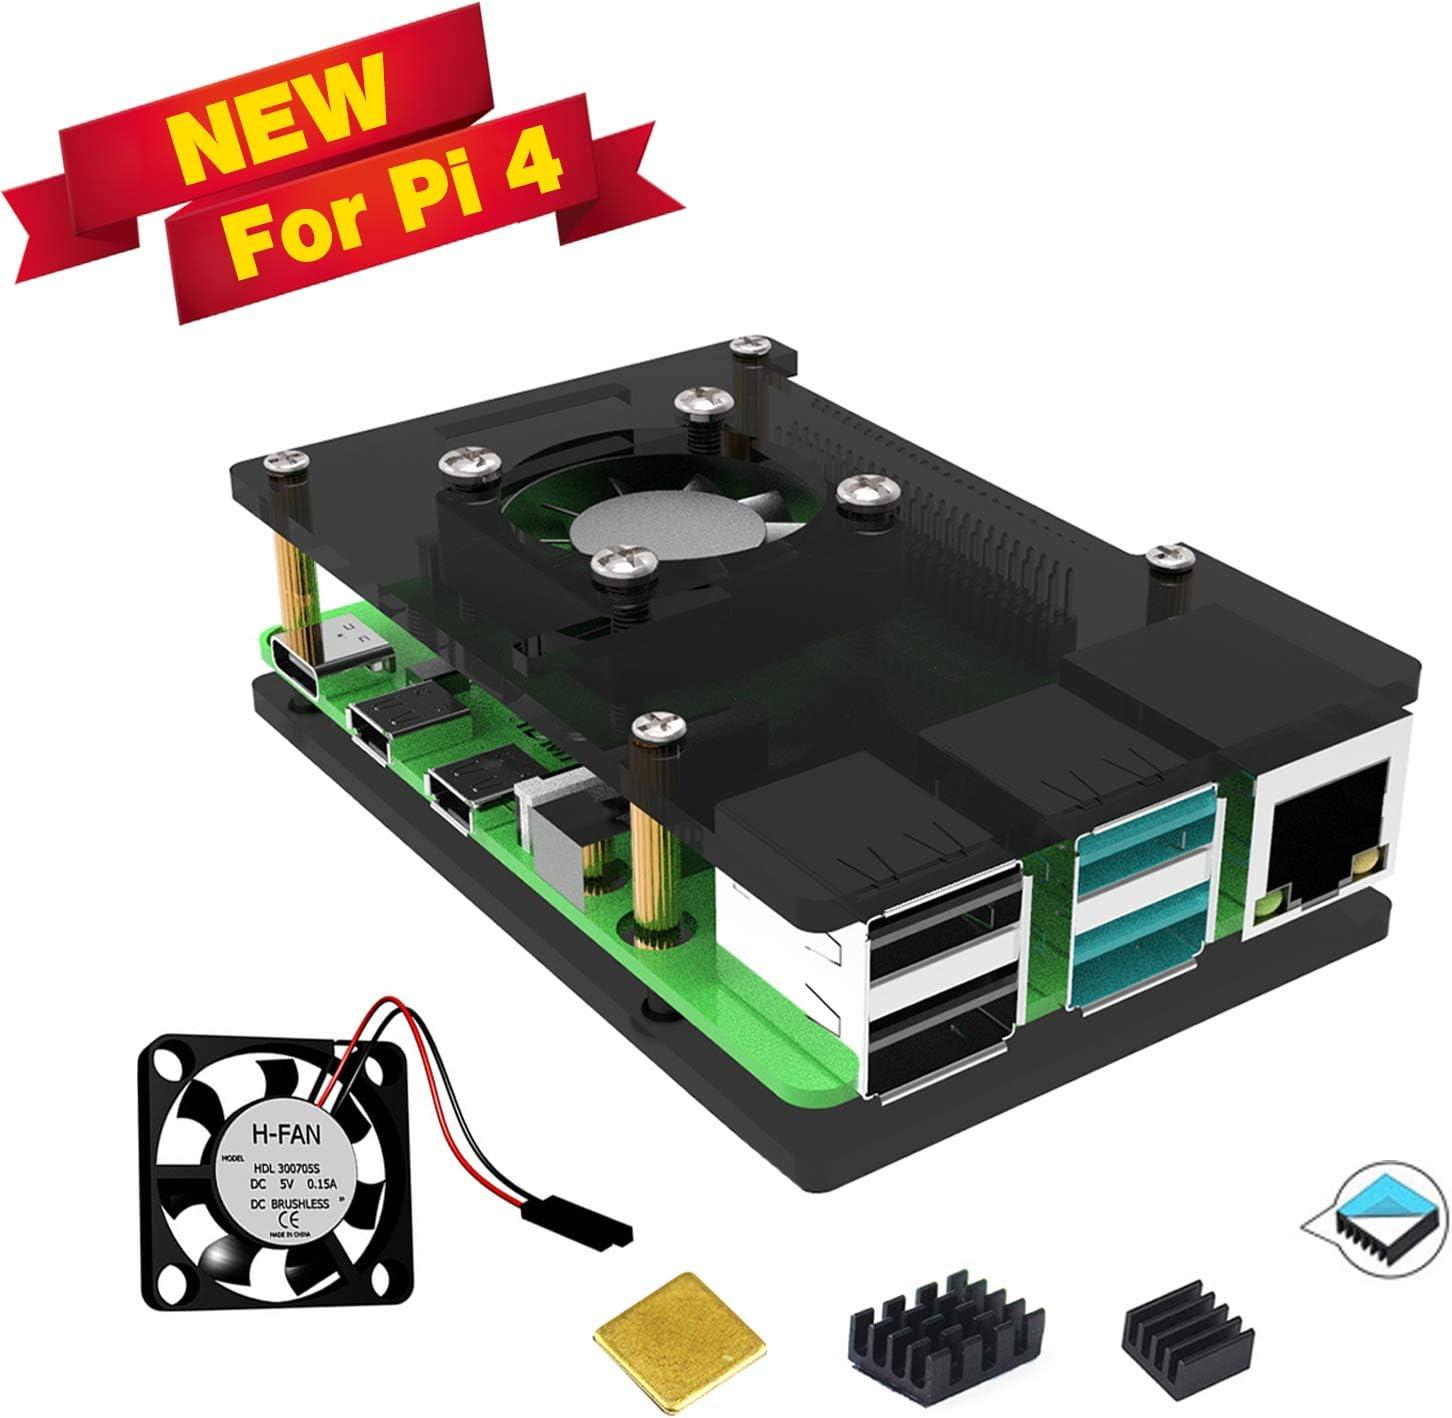 Jun-Electron Acrylic Case for Raspberry Pi 4 Model B with Cooling Fan,3 Heatsinks (Gray)